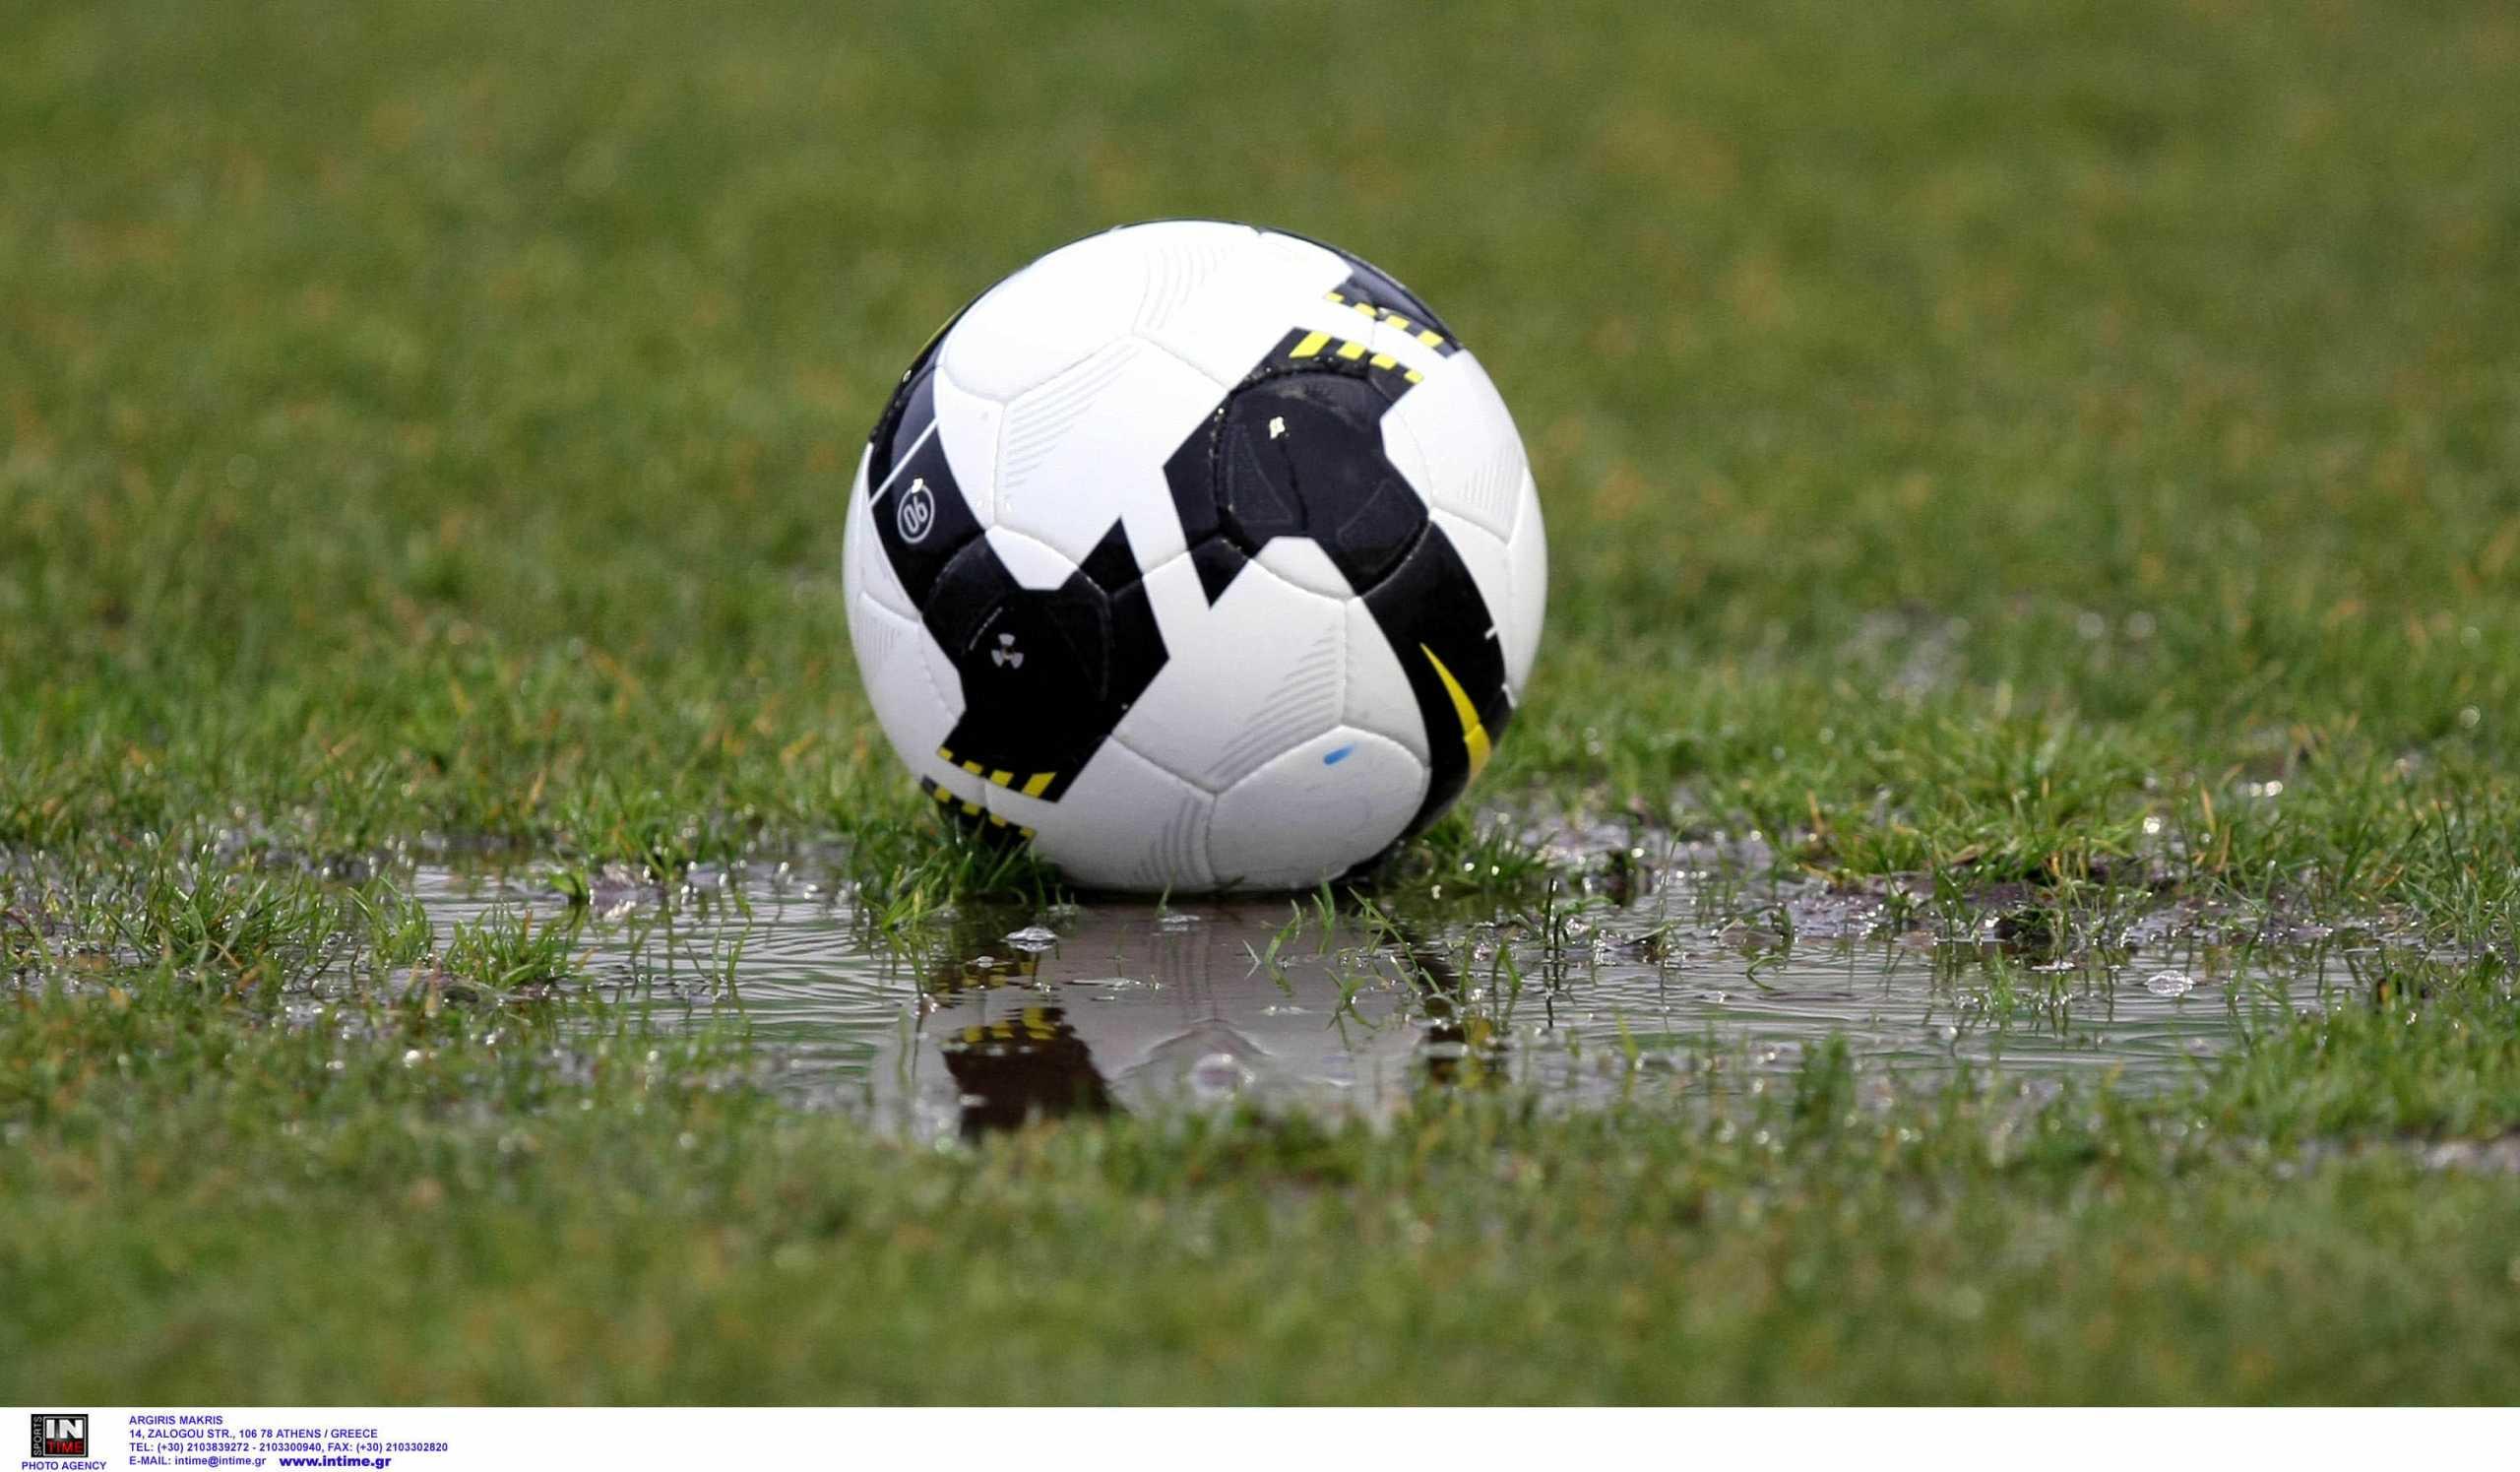 Football League: Μπαράζ αναβολών λόγω κορονοϊού